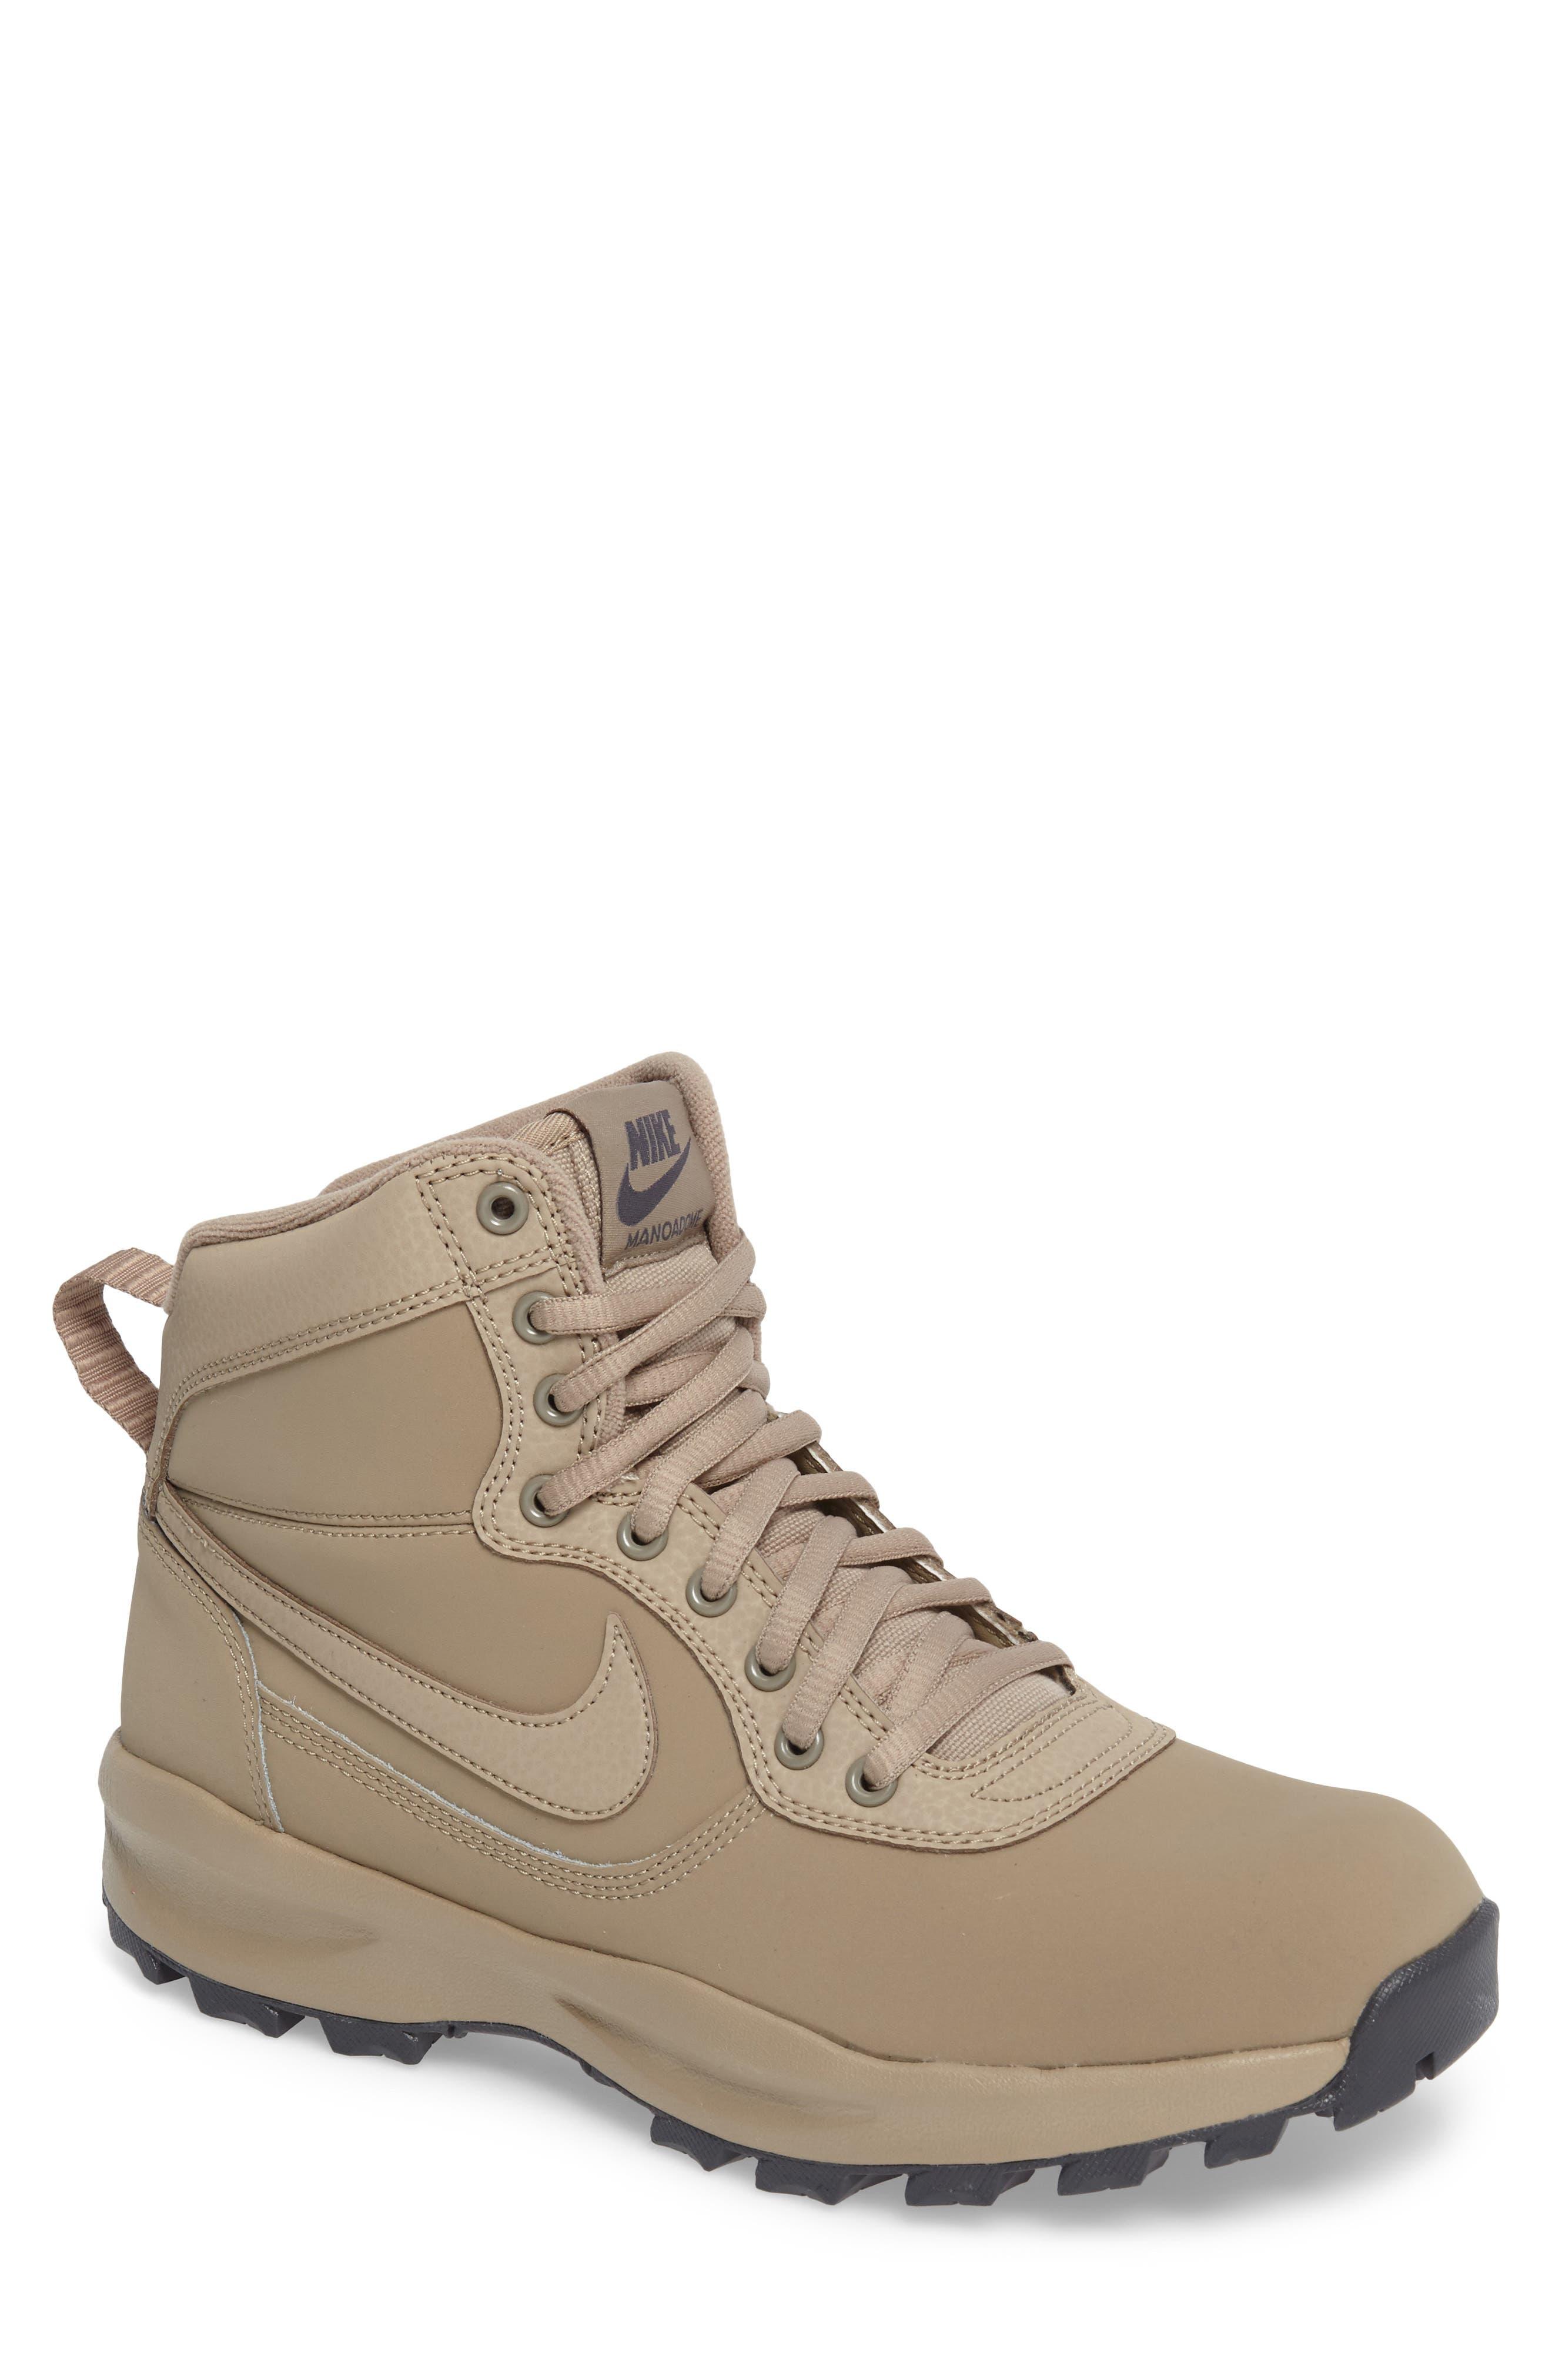 Main Image - Nike Manoadome Boot (Men)